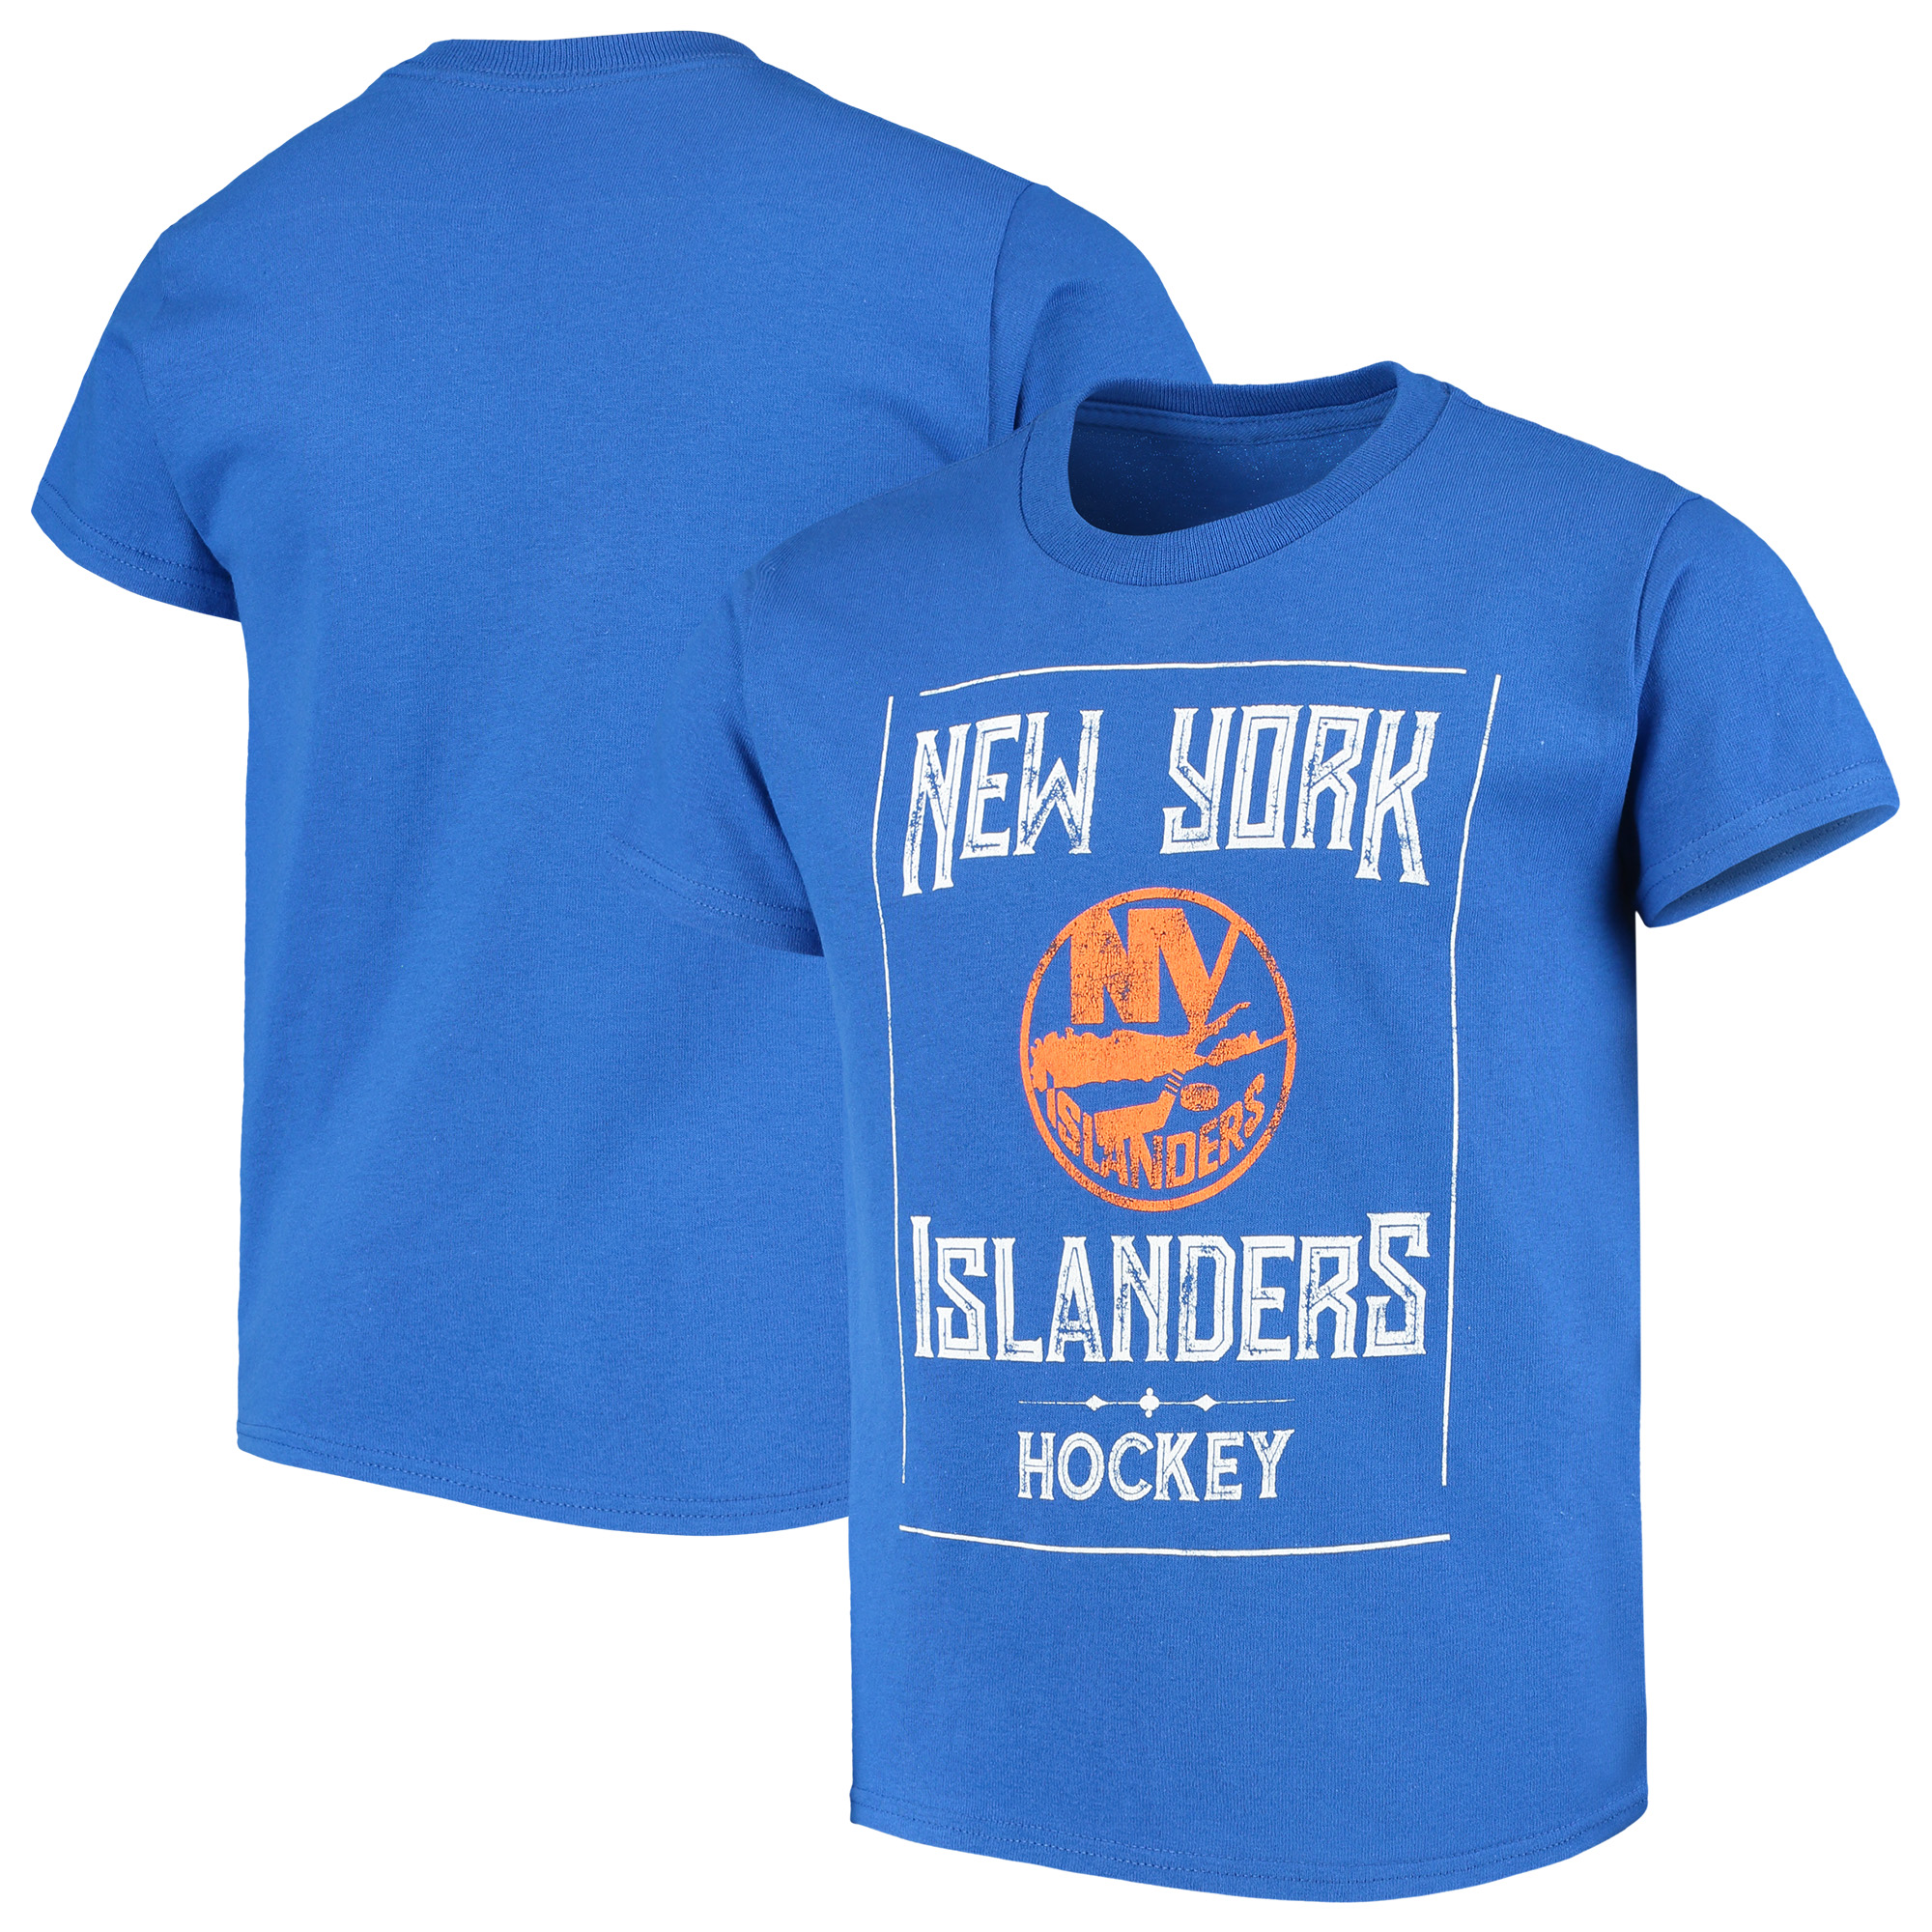 New York Islanders Youth T-Shirt - Royal